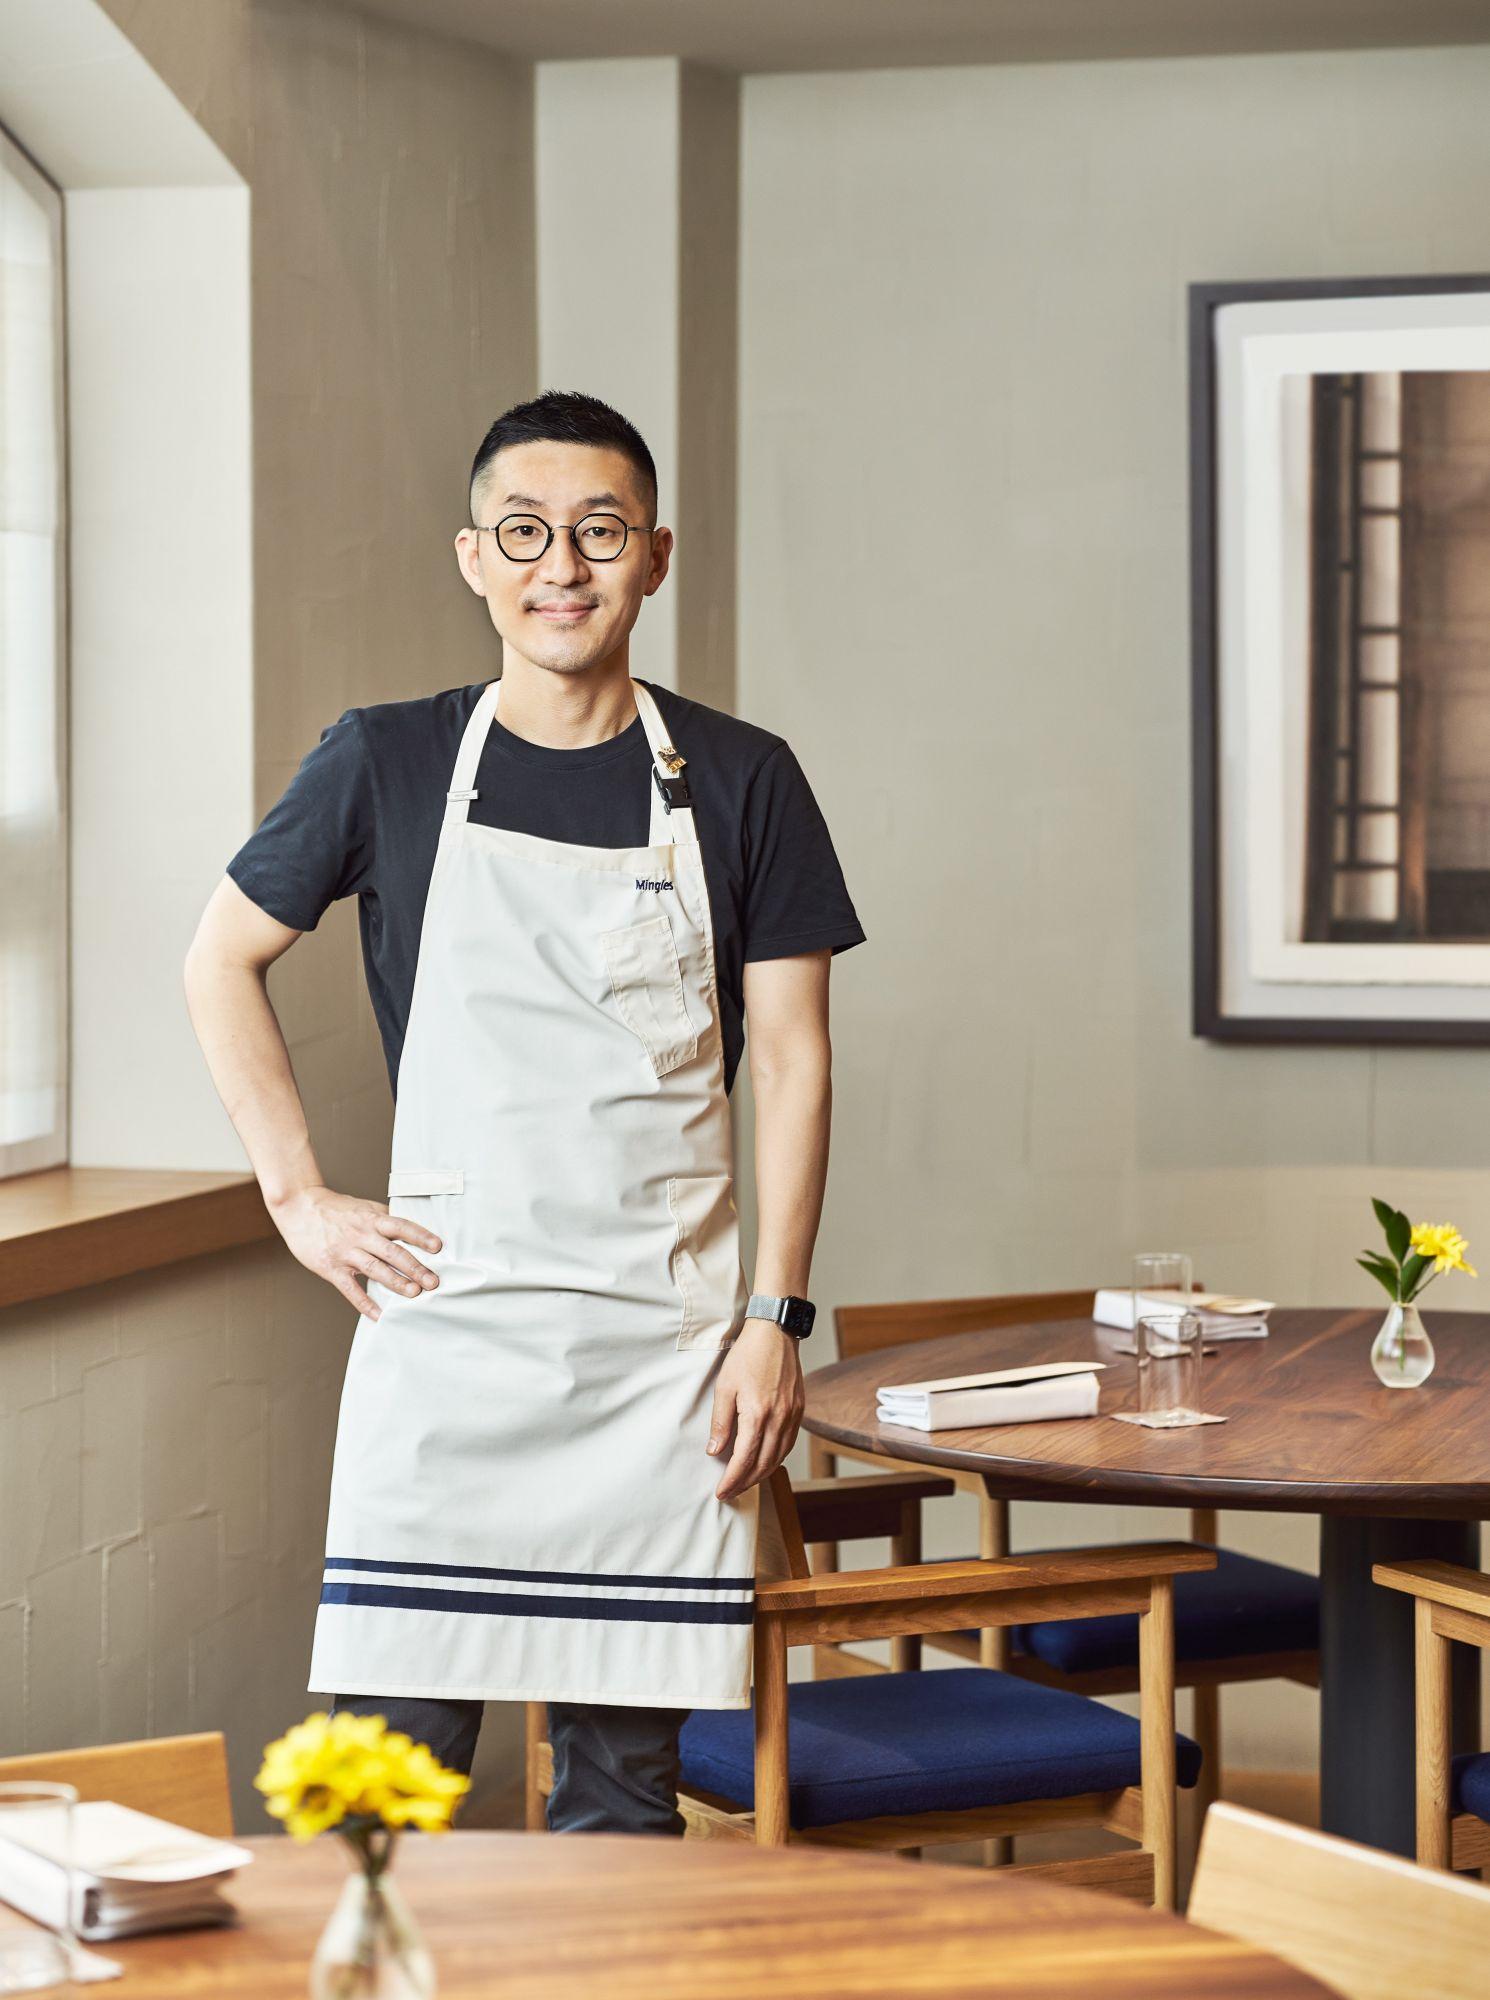 Chef Mingoo Kang Receives Inedit Damm Chefs' Choice Award 2021 By Asia's 50 Best Restaurants